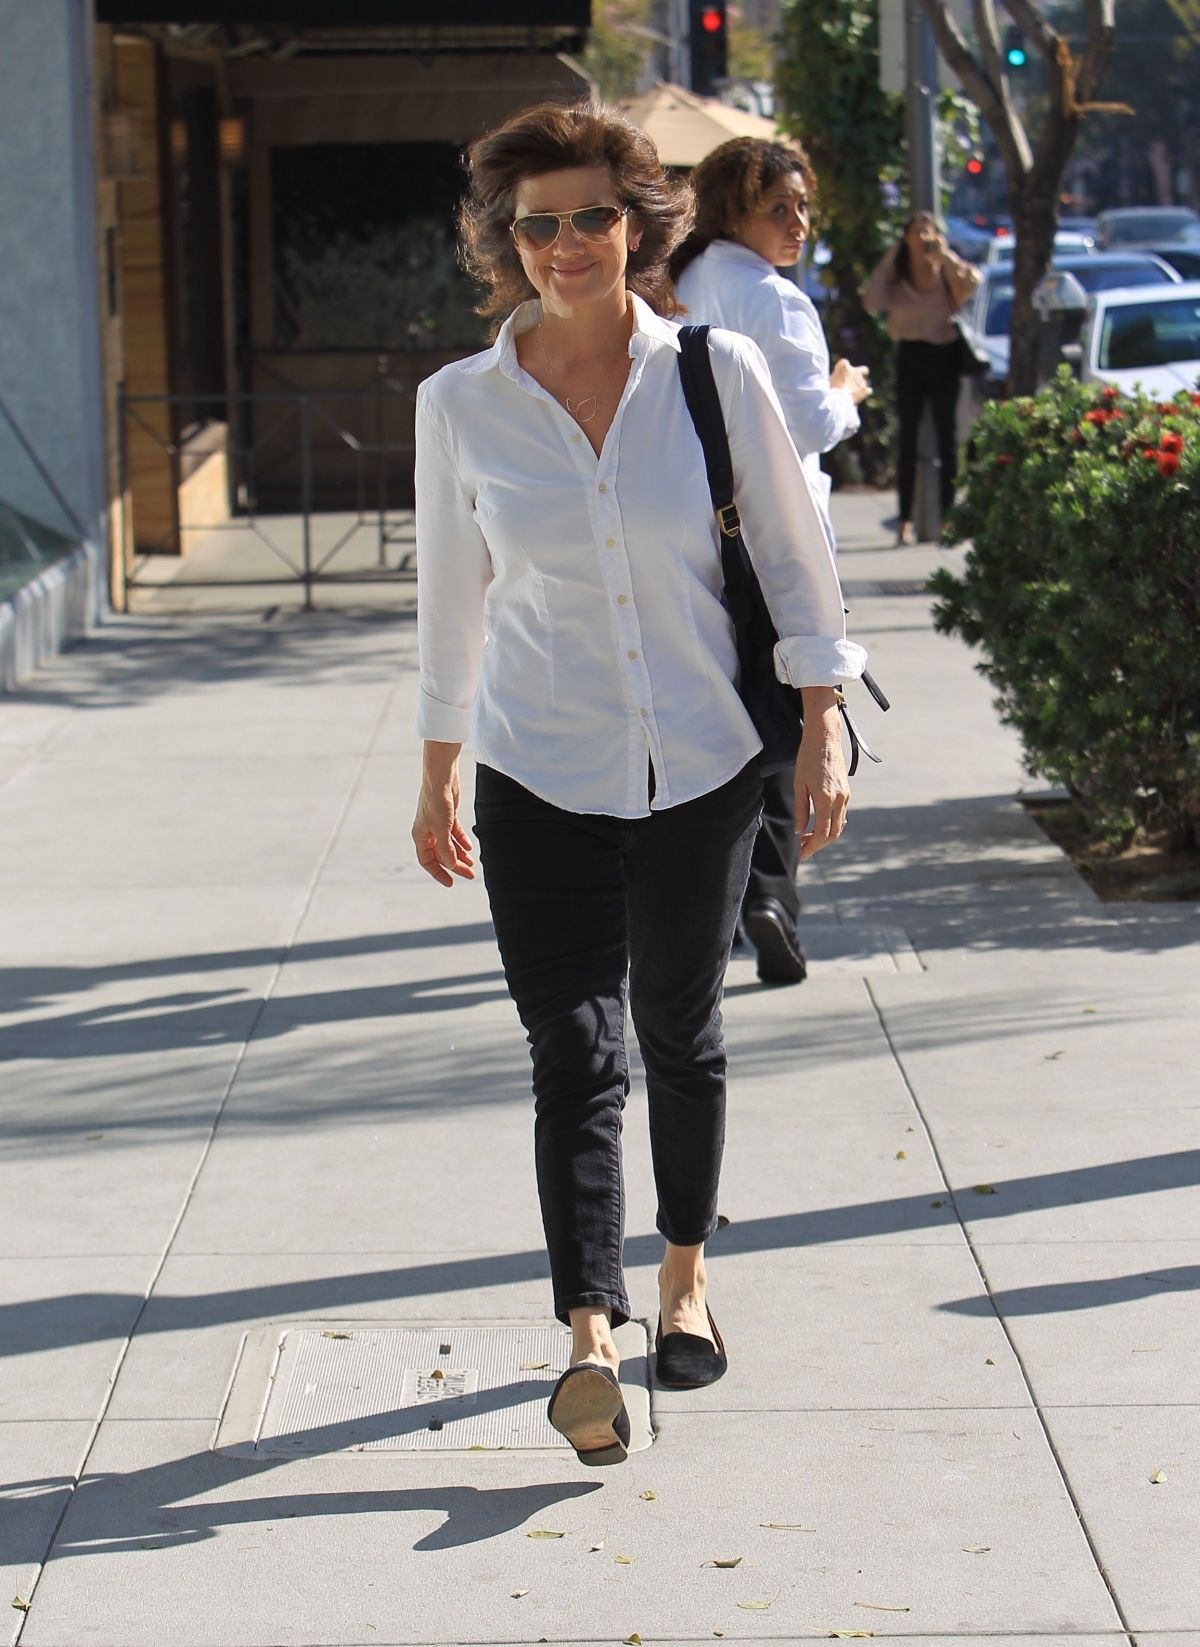 Natalie Portman,Suzy Bloom Hot video Blanka Bohdanova,Heather Headley